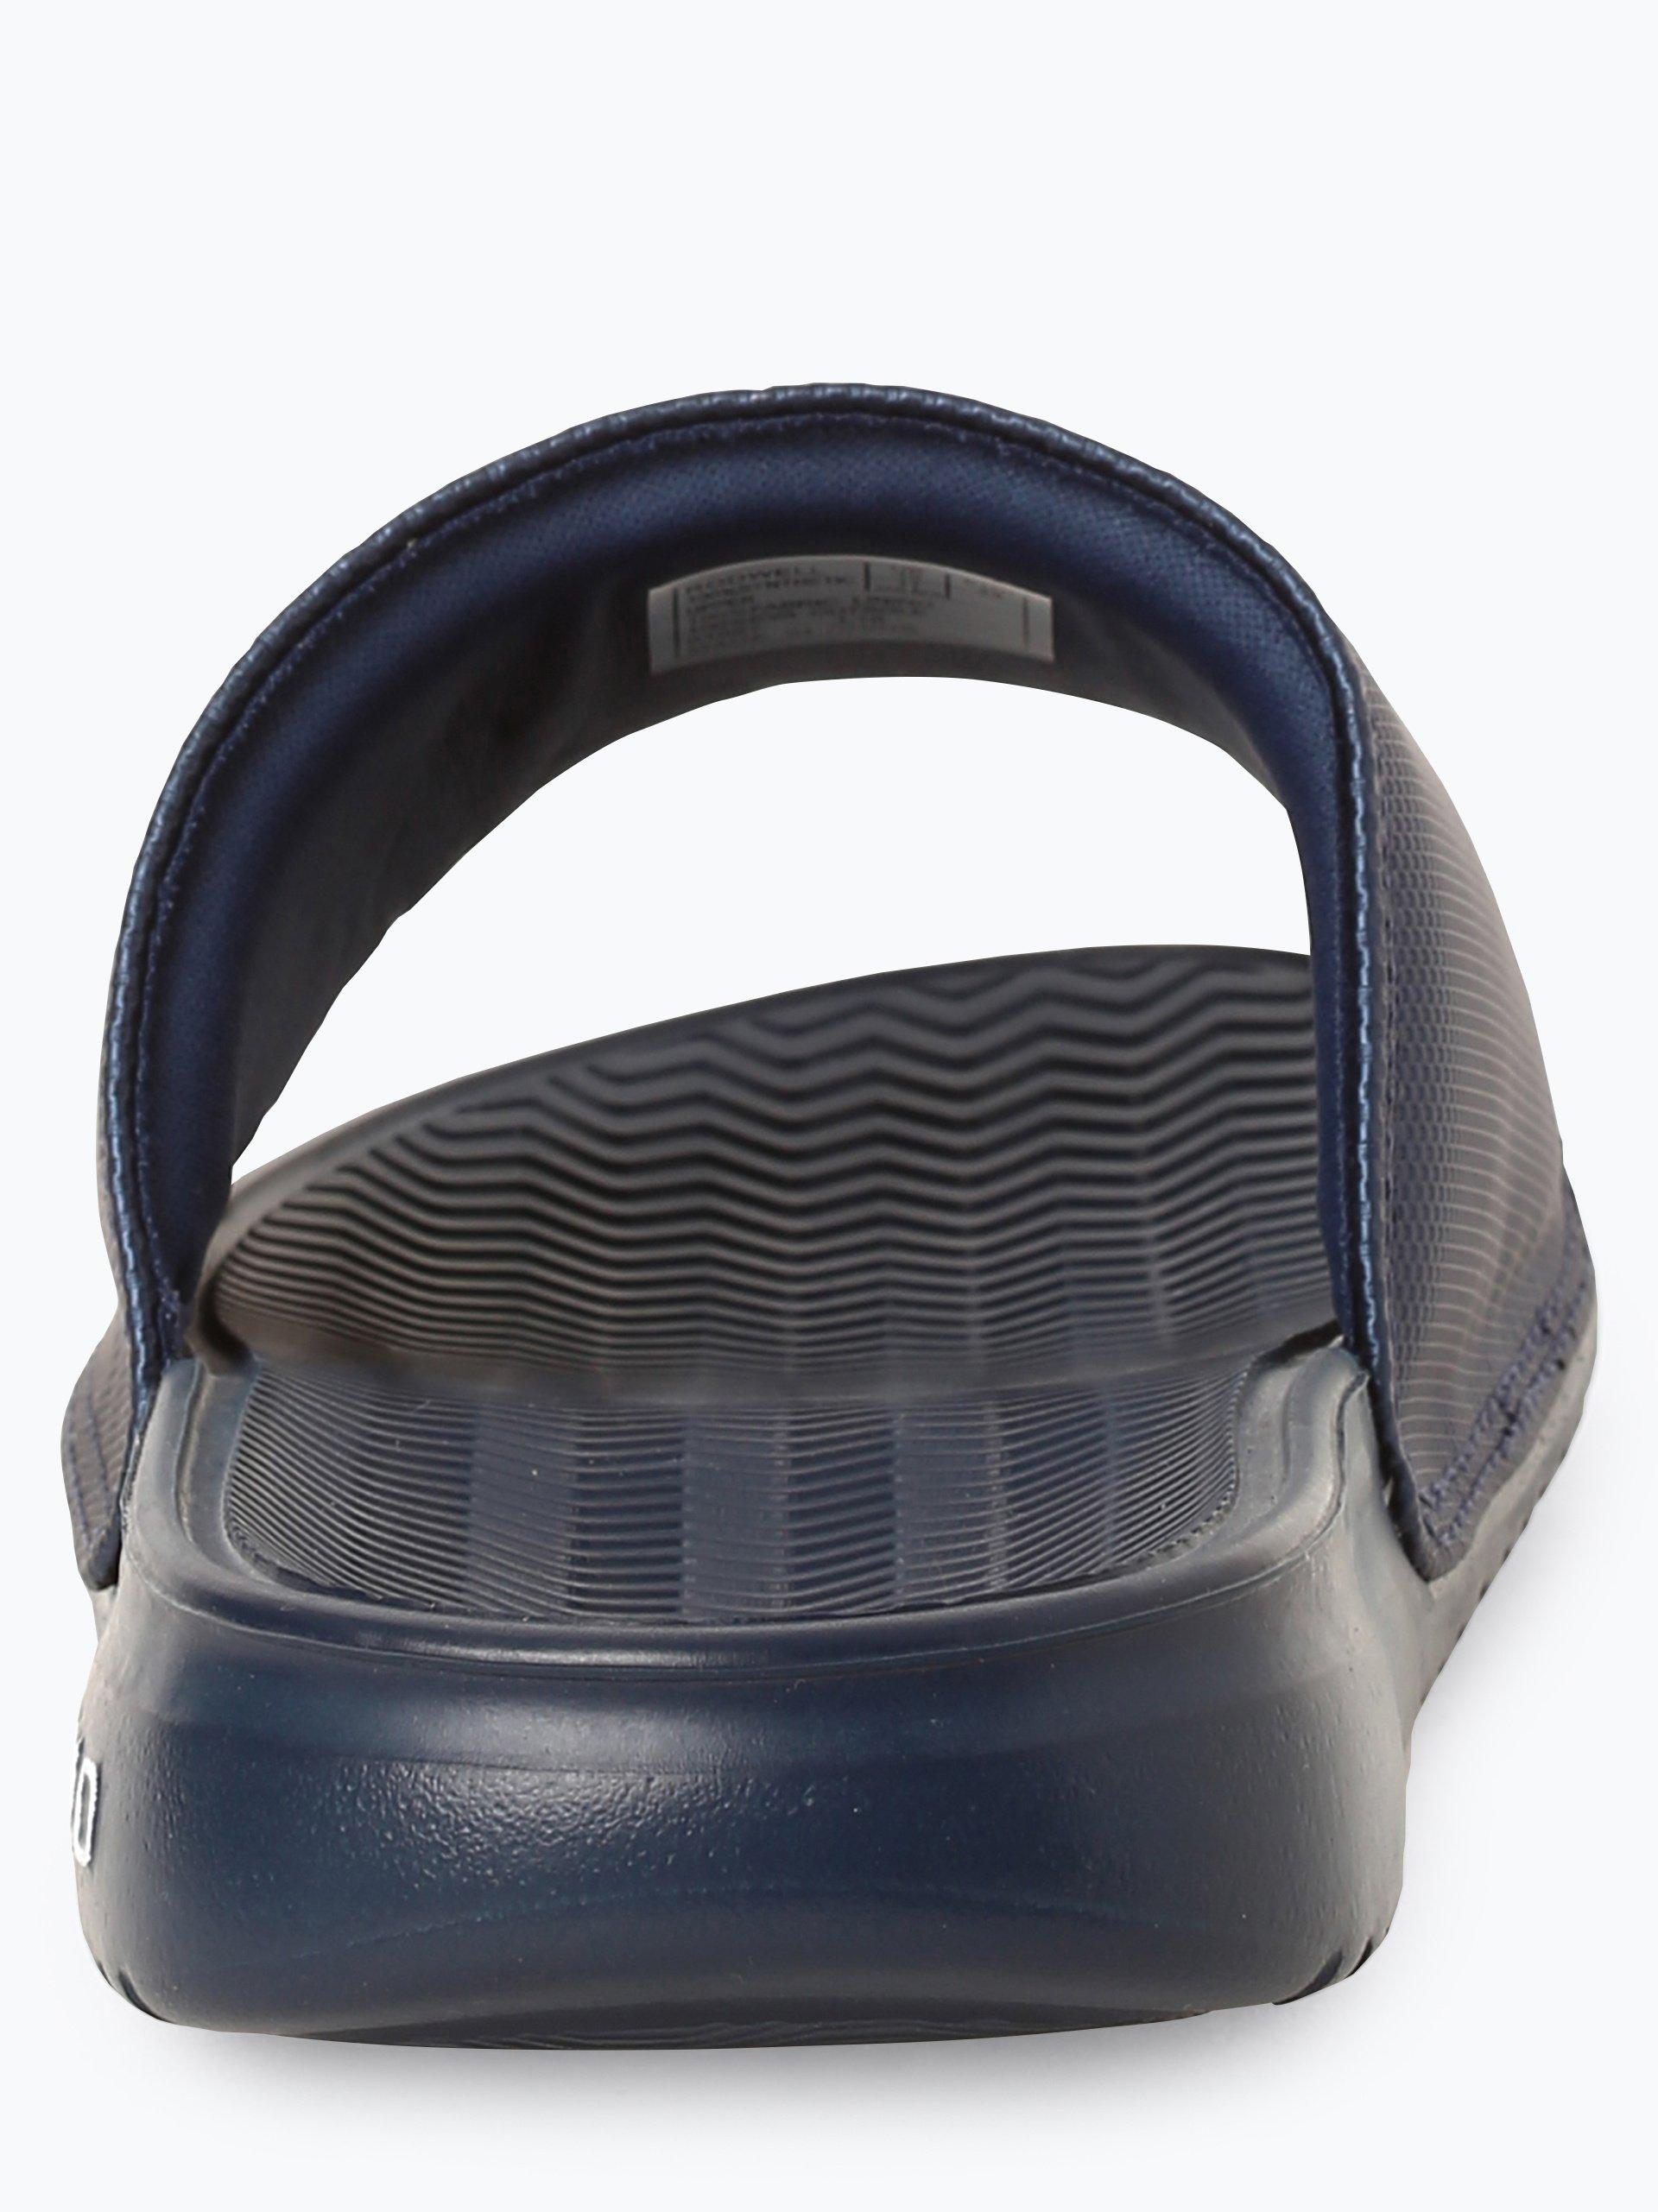 Polo Ralph Lauren Męskie pantofle kąpielowe